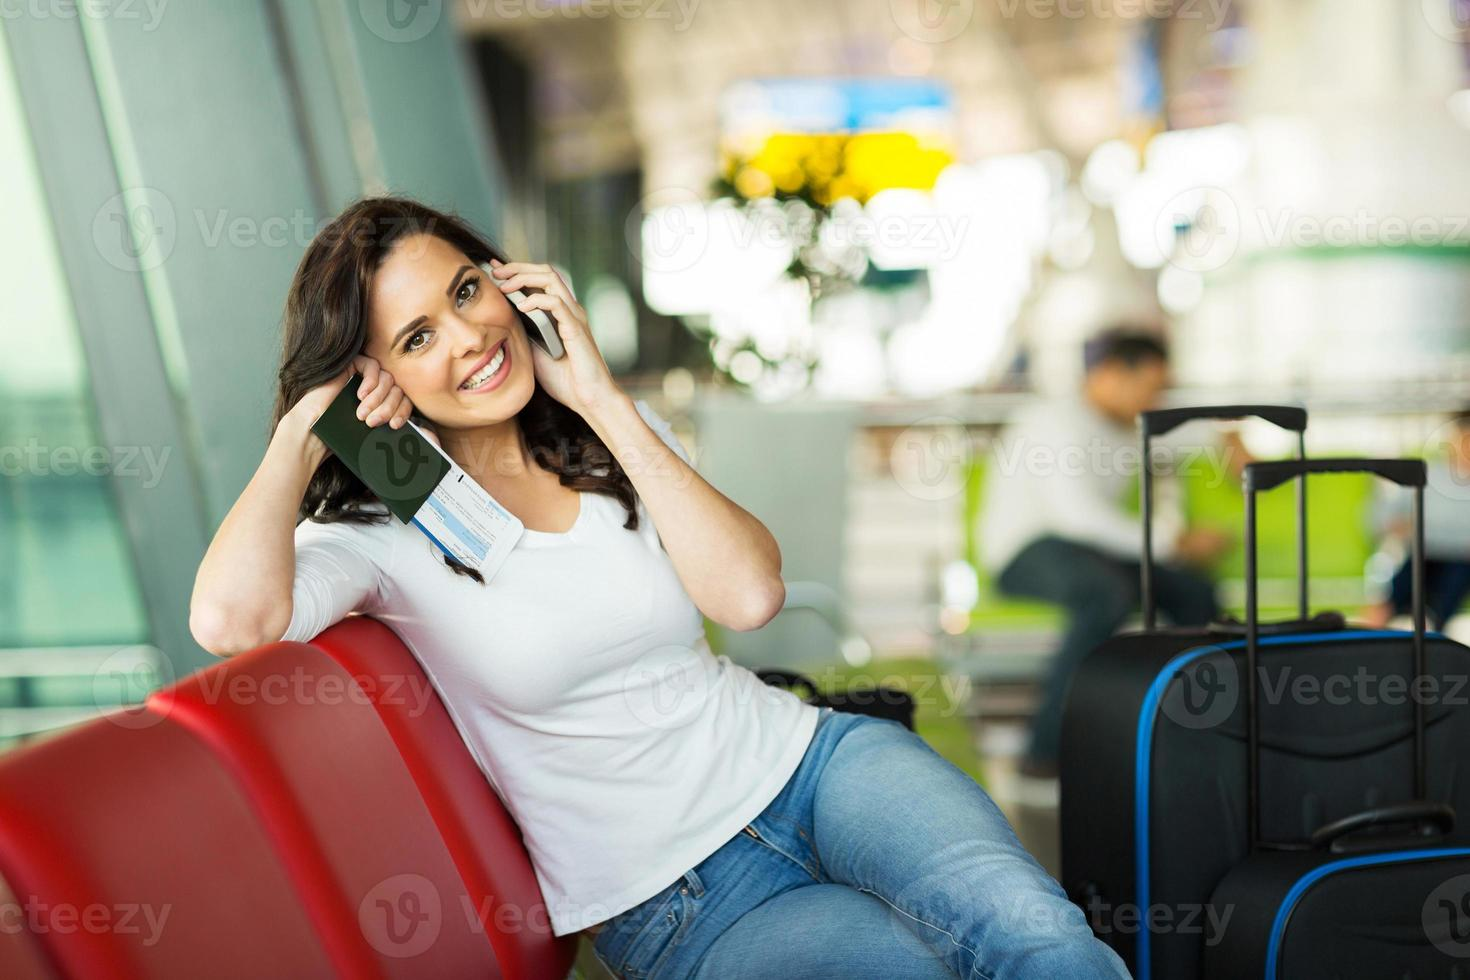 femme gaie, parler téléphone portable photo